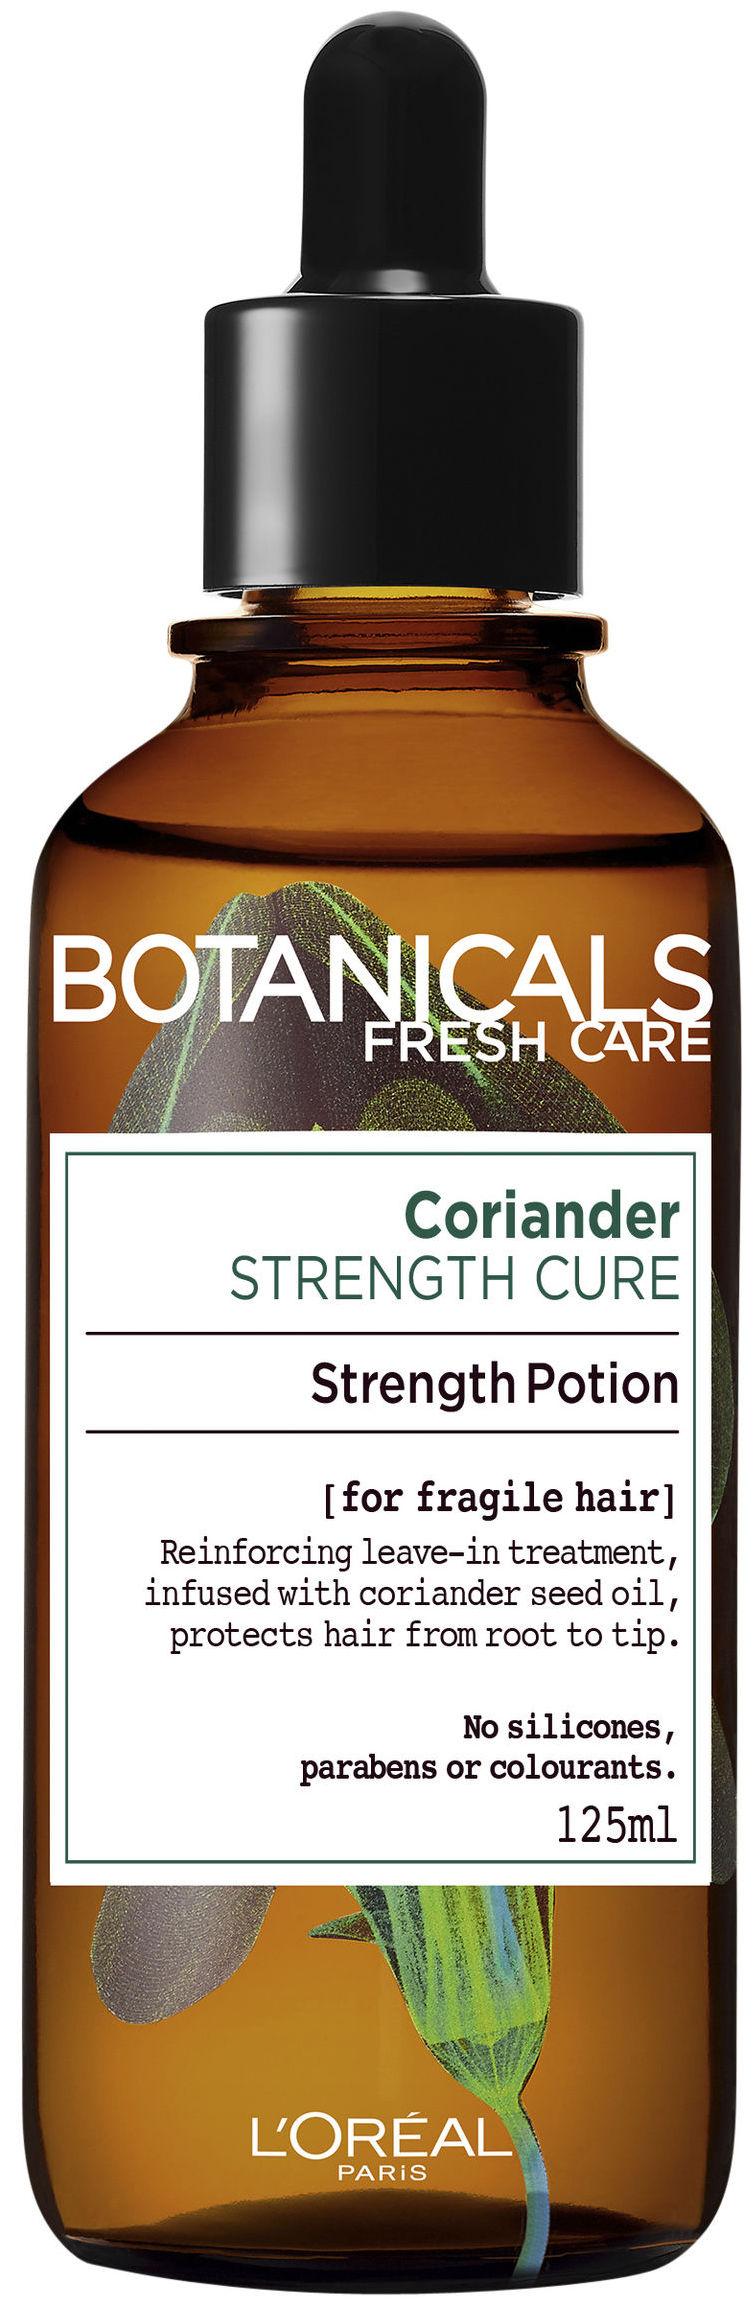 "סרום טבעי לשיער 125 מ""ל L'Oréal Paris Botanicals Fresh Care Coriander StrengthCure Potion"